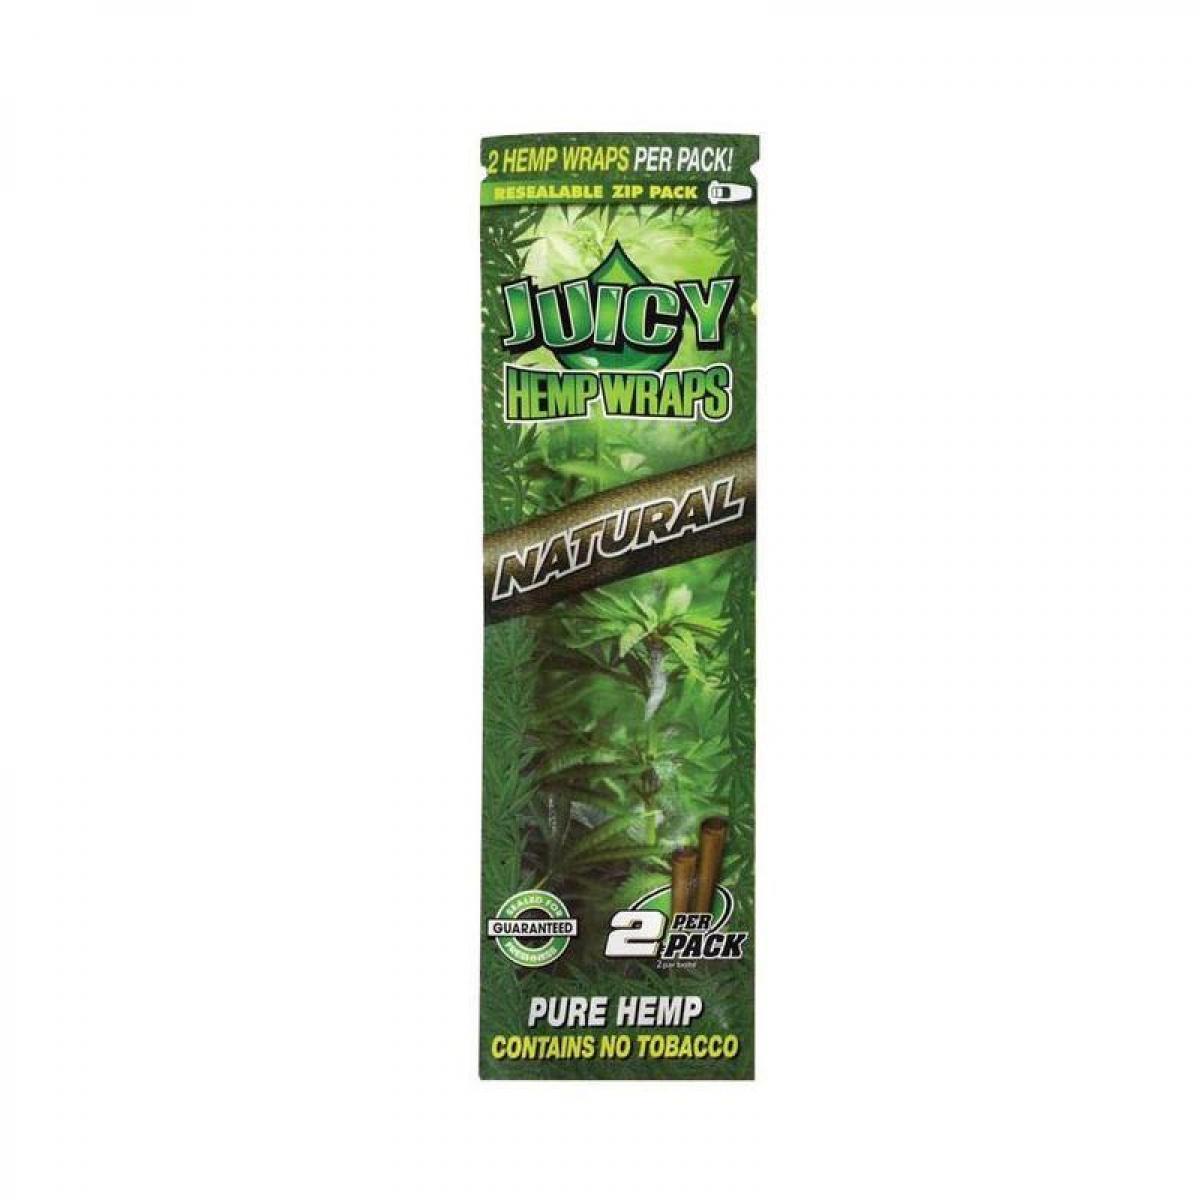 Juicy Jays Hemp Wraps - Natural (2pk)